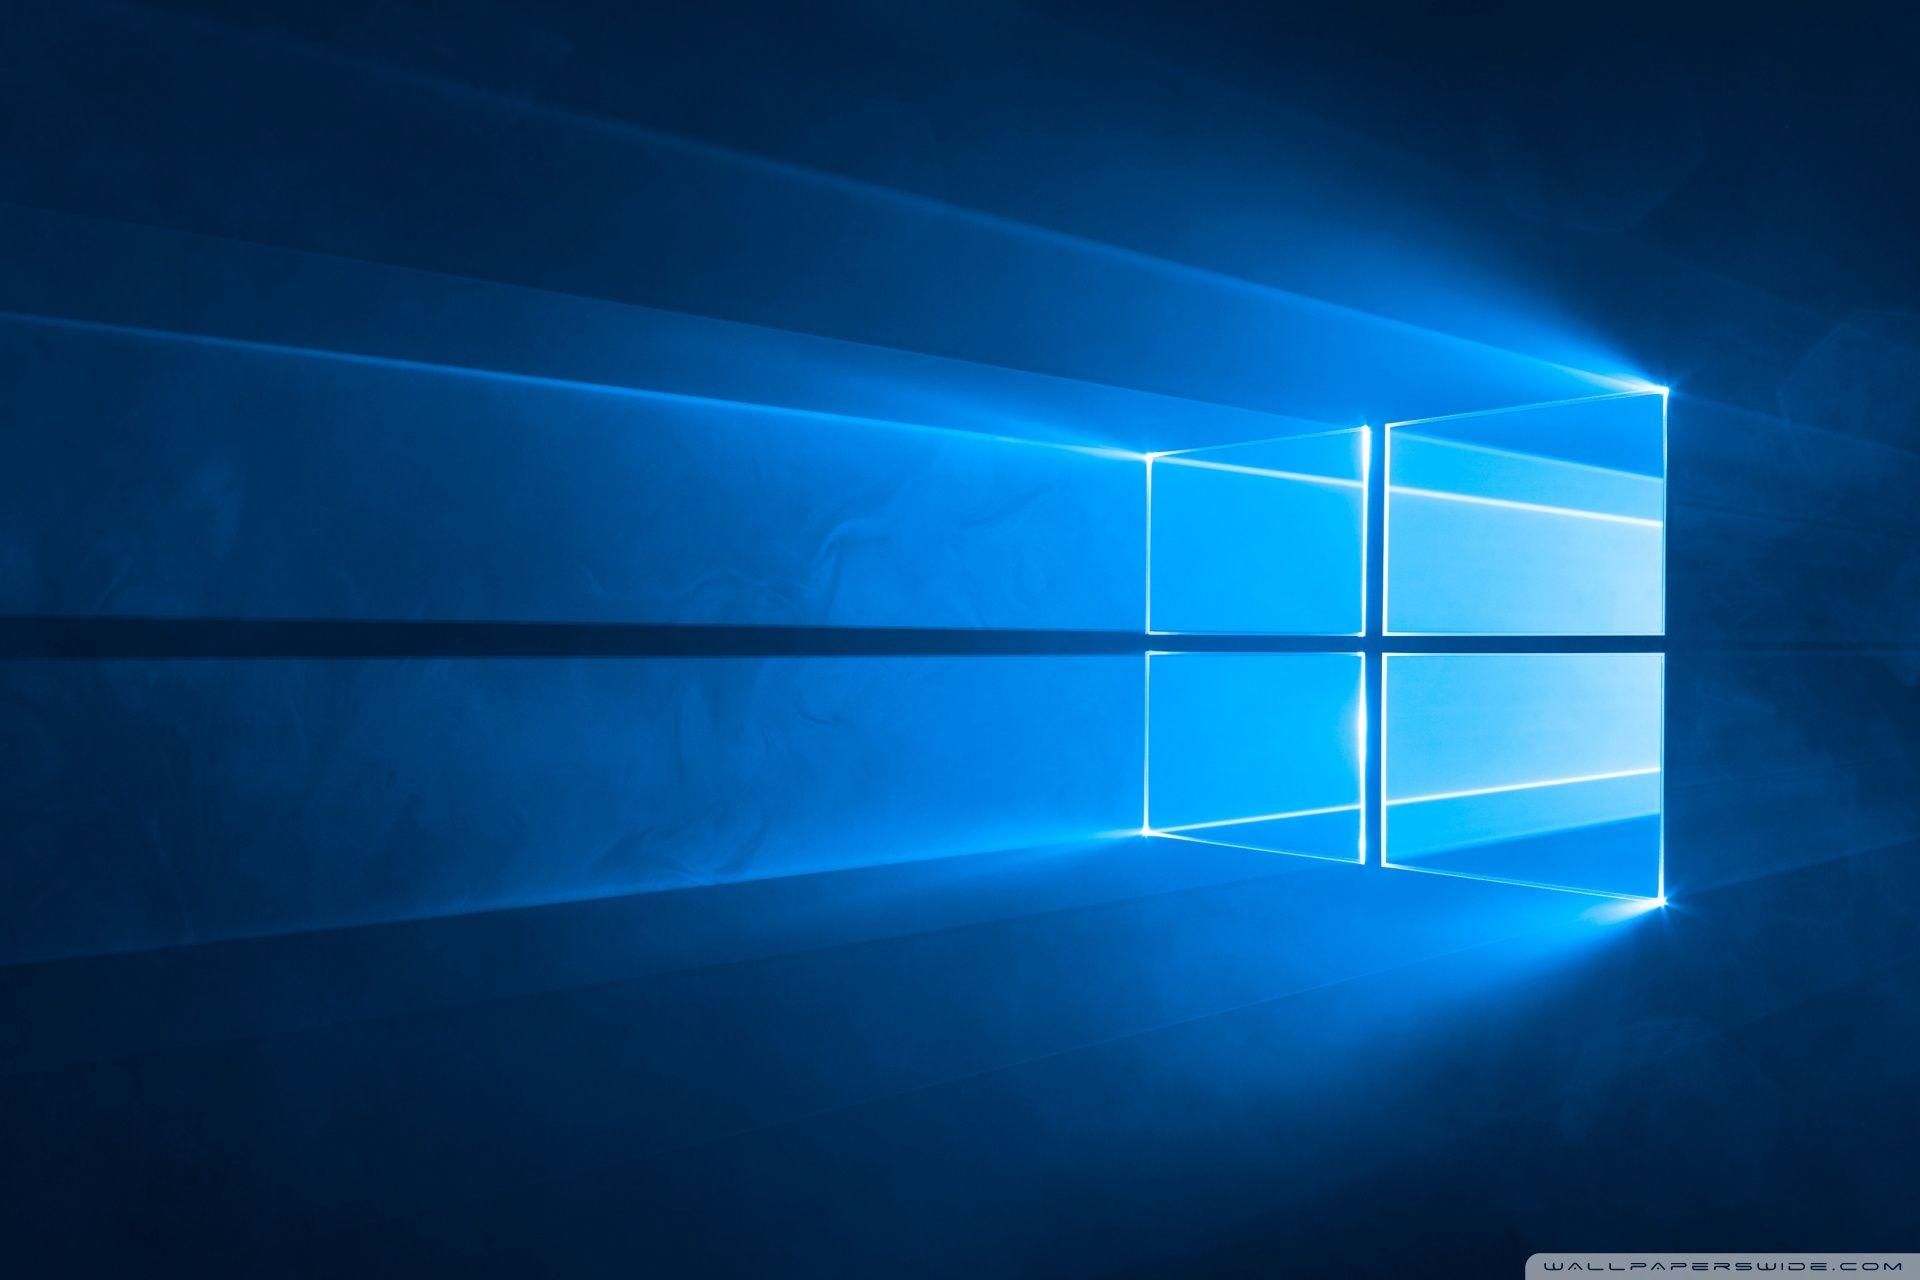 Windows 10 Hero 4k Hd Desktop Wallpaper Widescreen Fullscreen Microsoft Wallpaper Windows 10 Window Installation